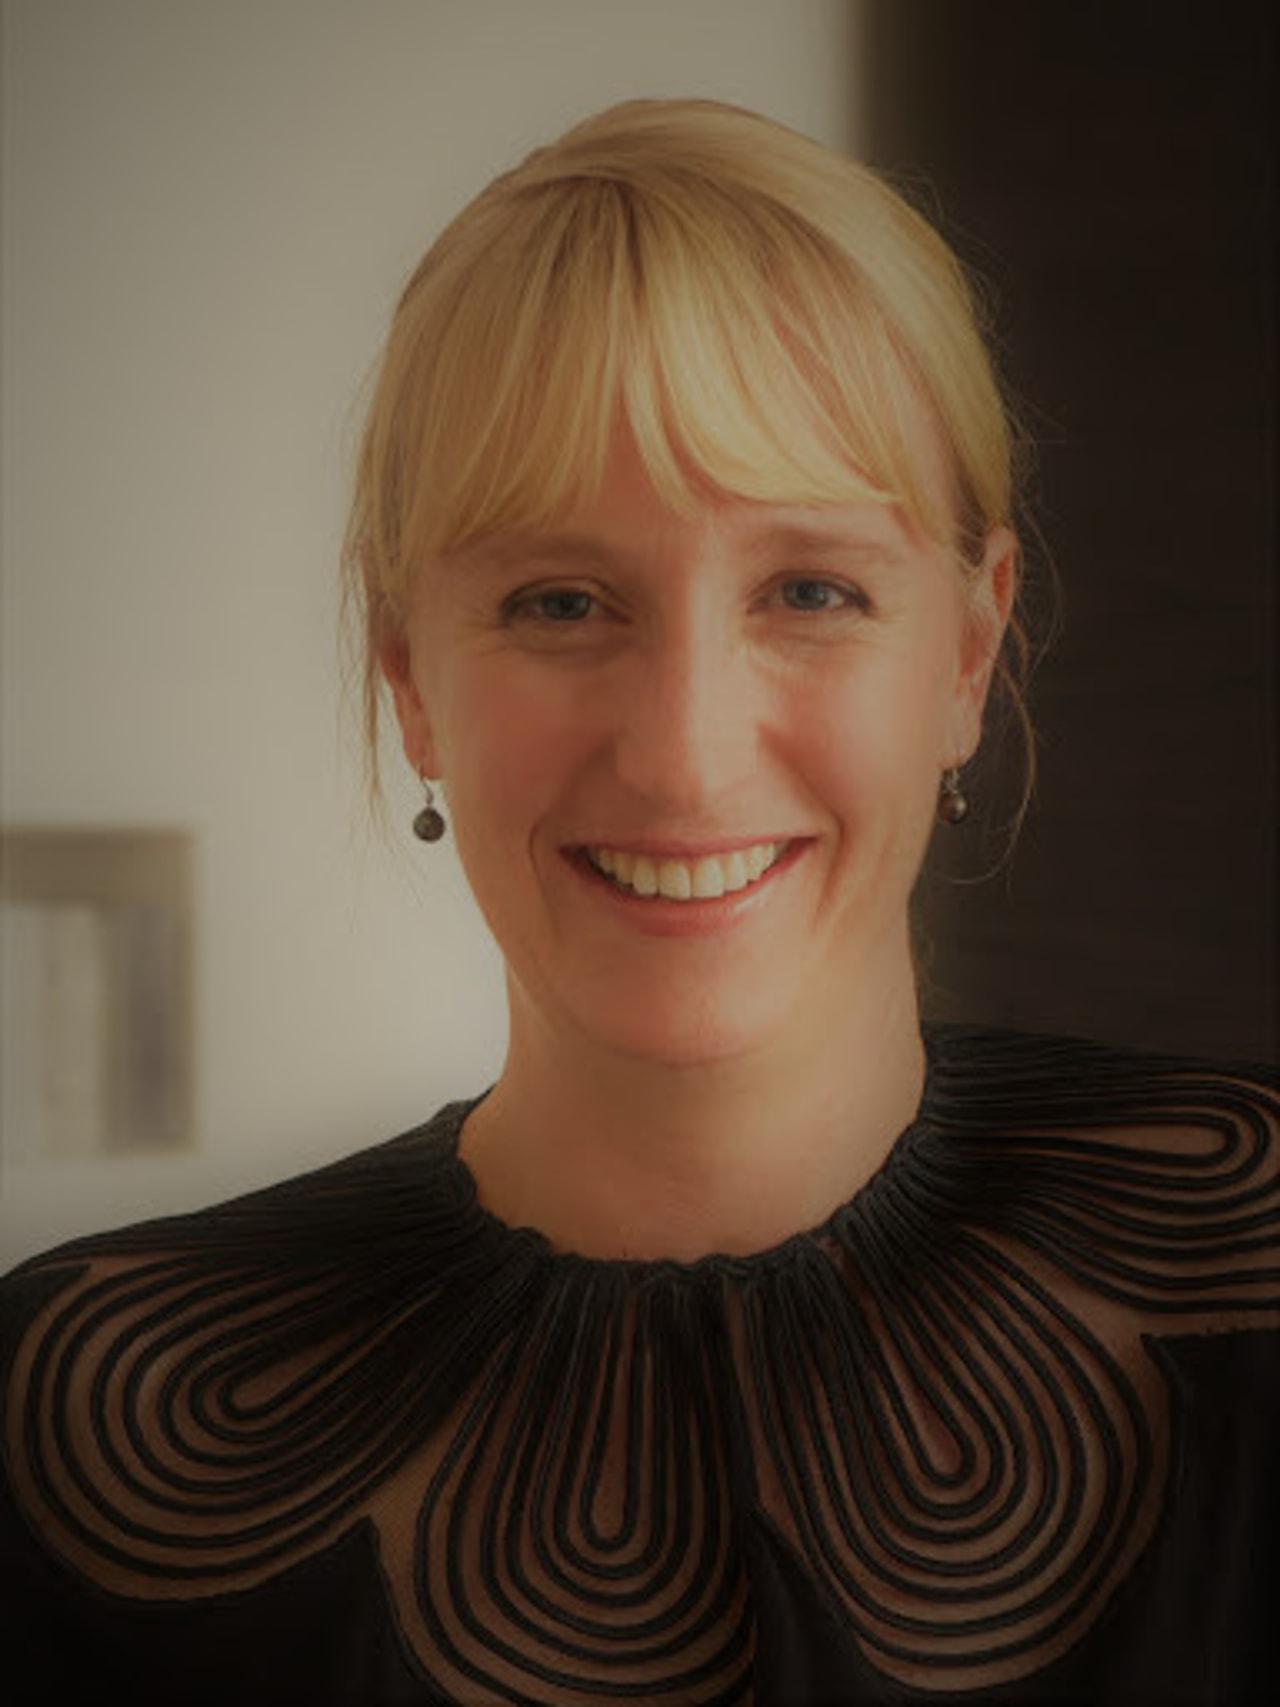 Davinia Sutton, owner of Detail by Davinia, specialising